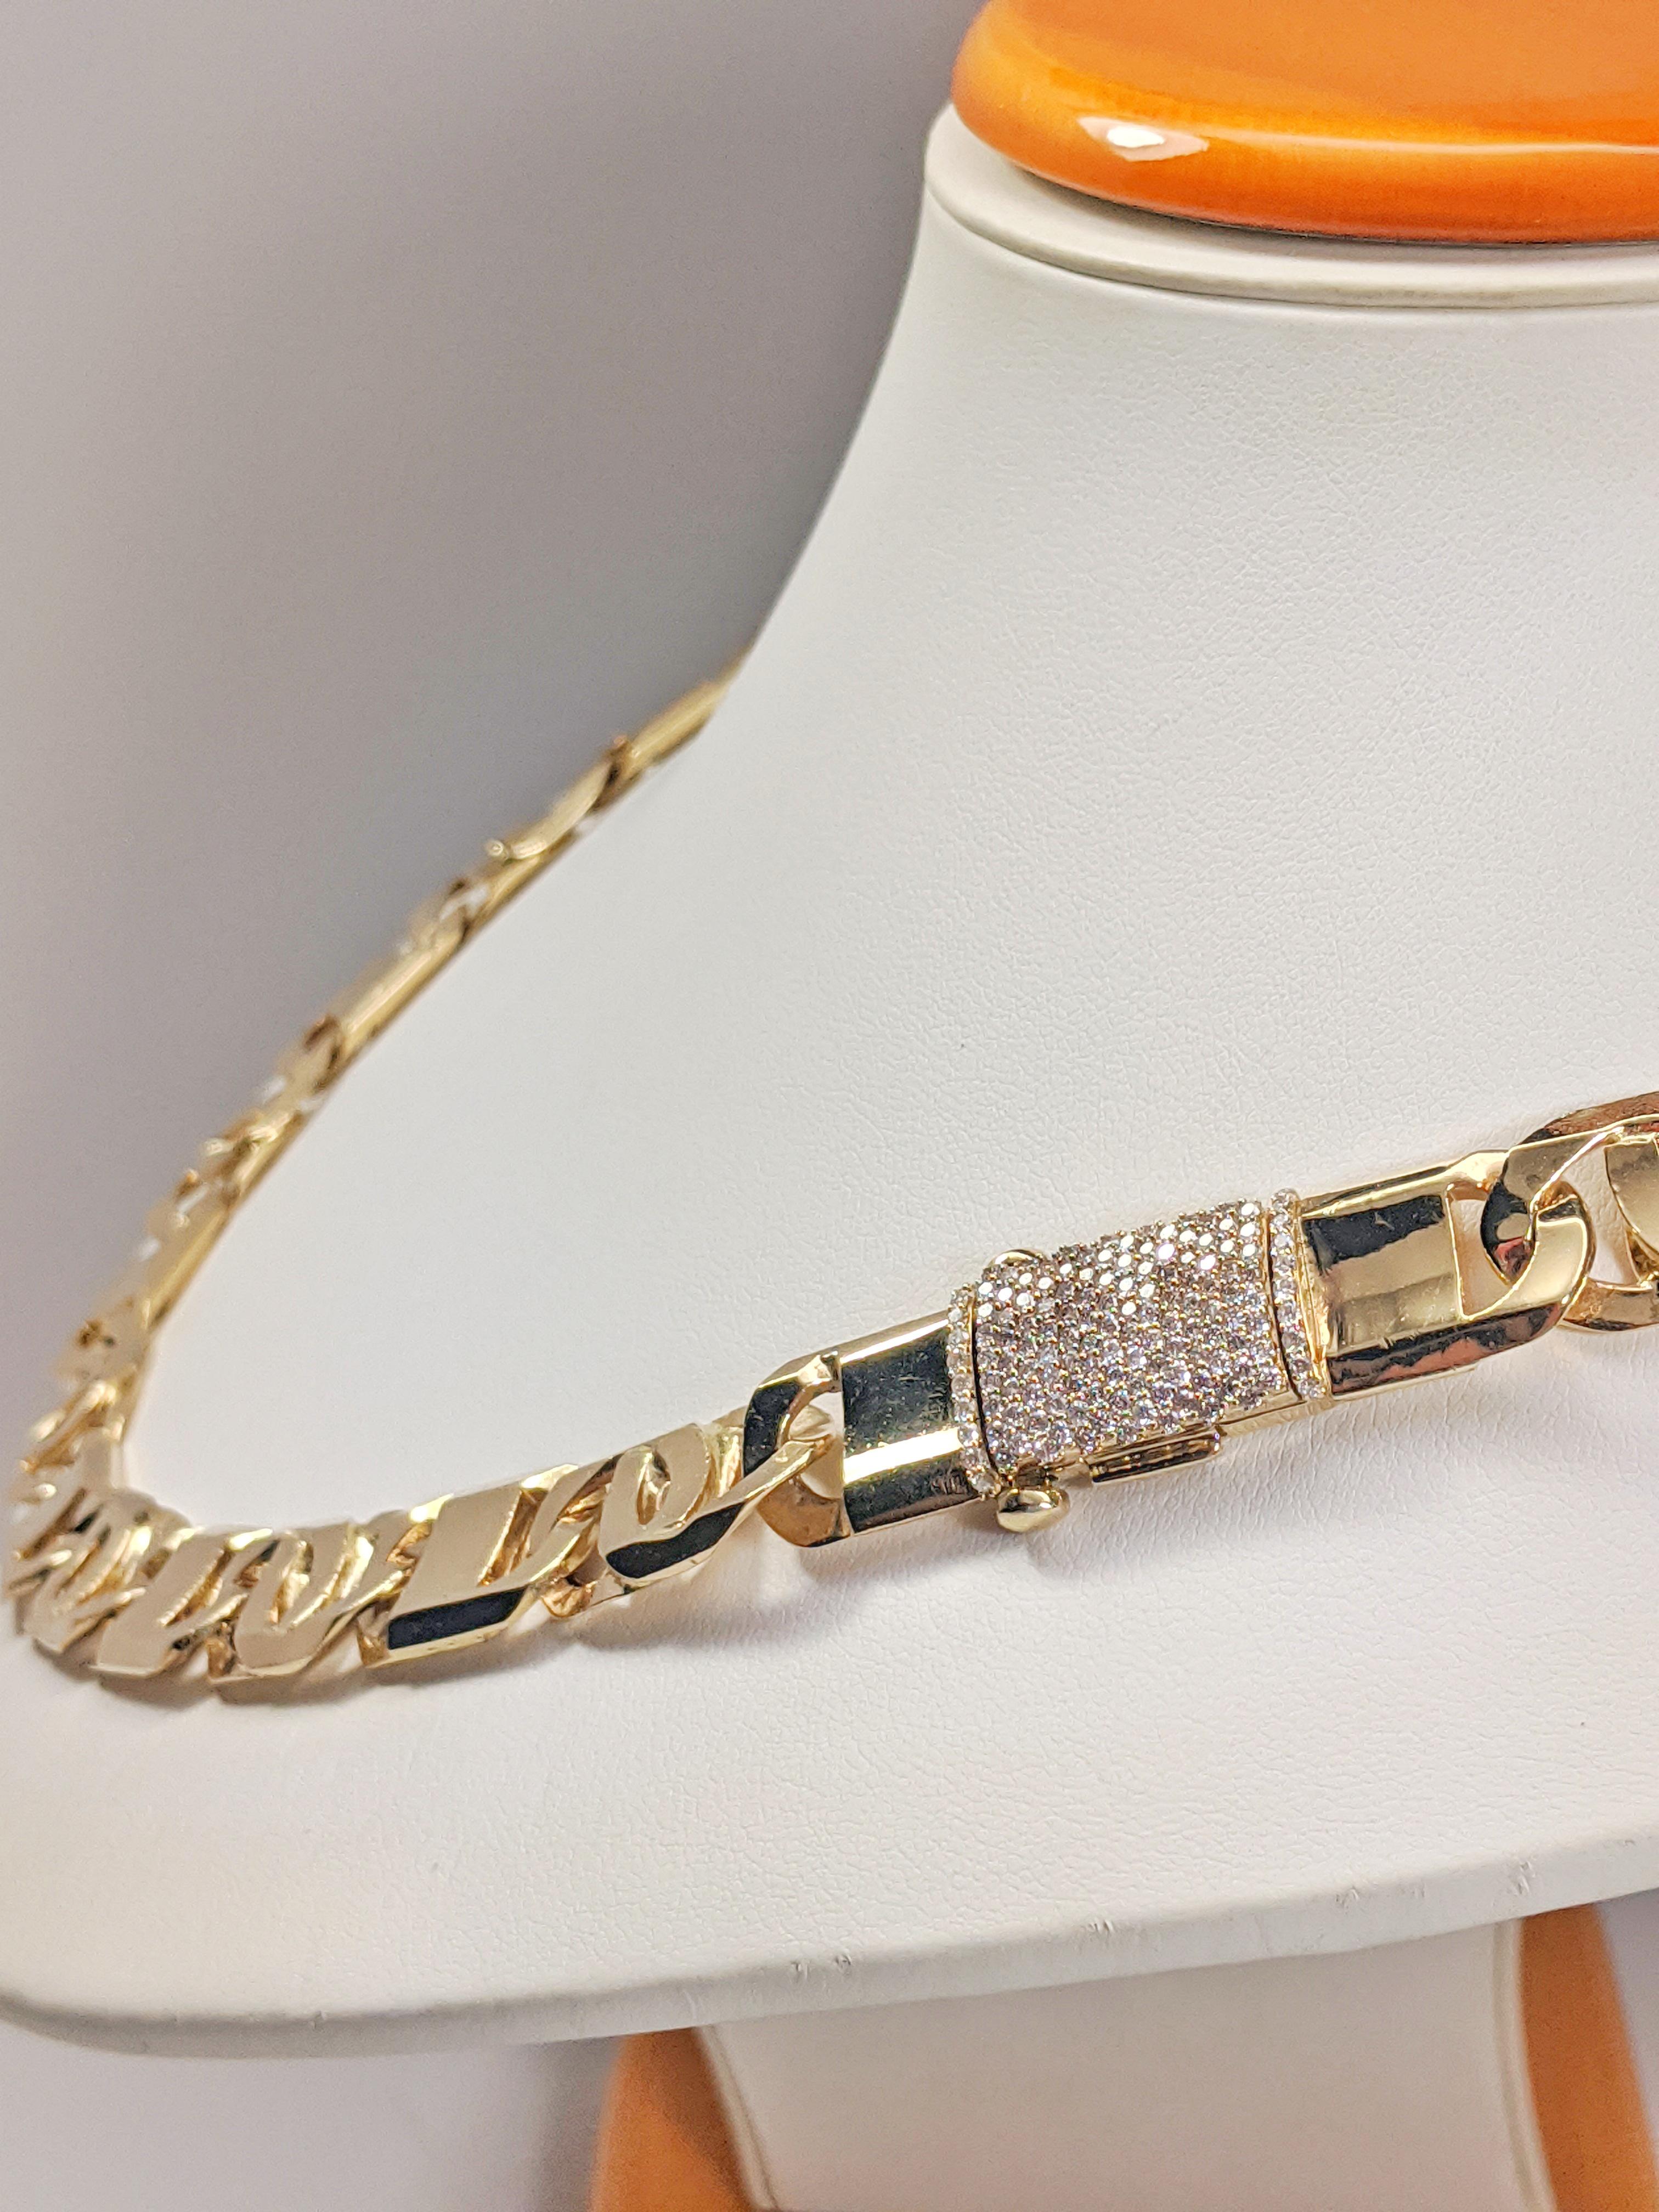 14KT Yellow Gold Solid Heavy Fancy Tiger Eye Link Chain, Hand Made Italian Chain 12MM wide, VVS Pave Diamond Lock, Cuban Box Lock, Lock Side View w/chain